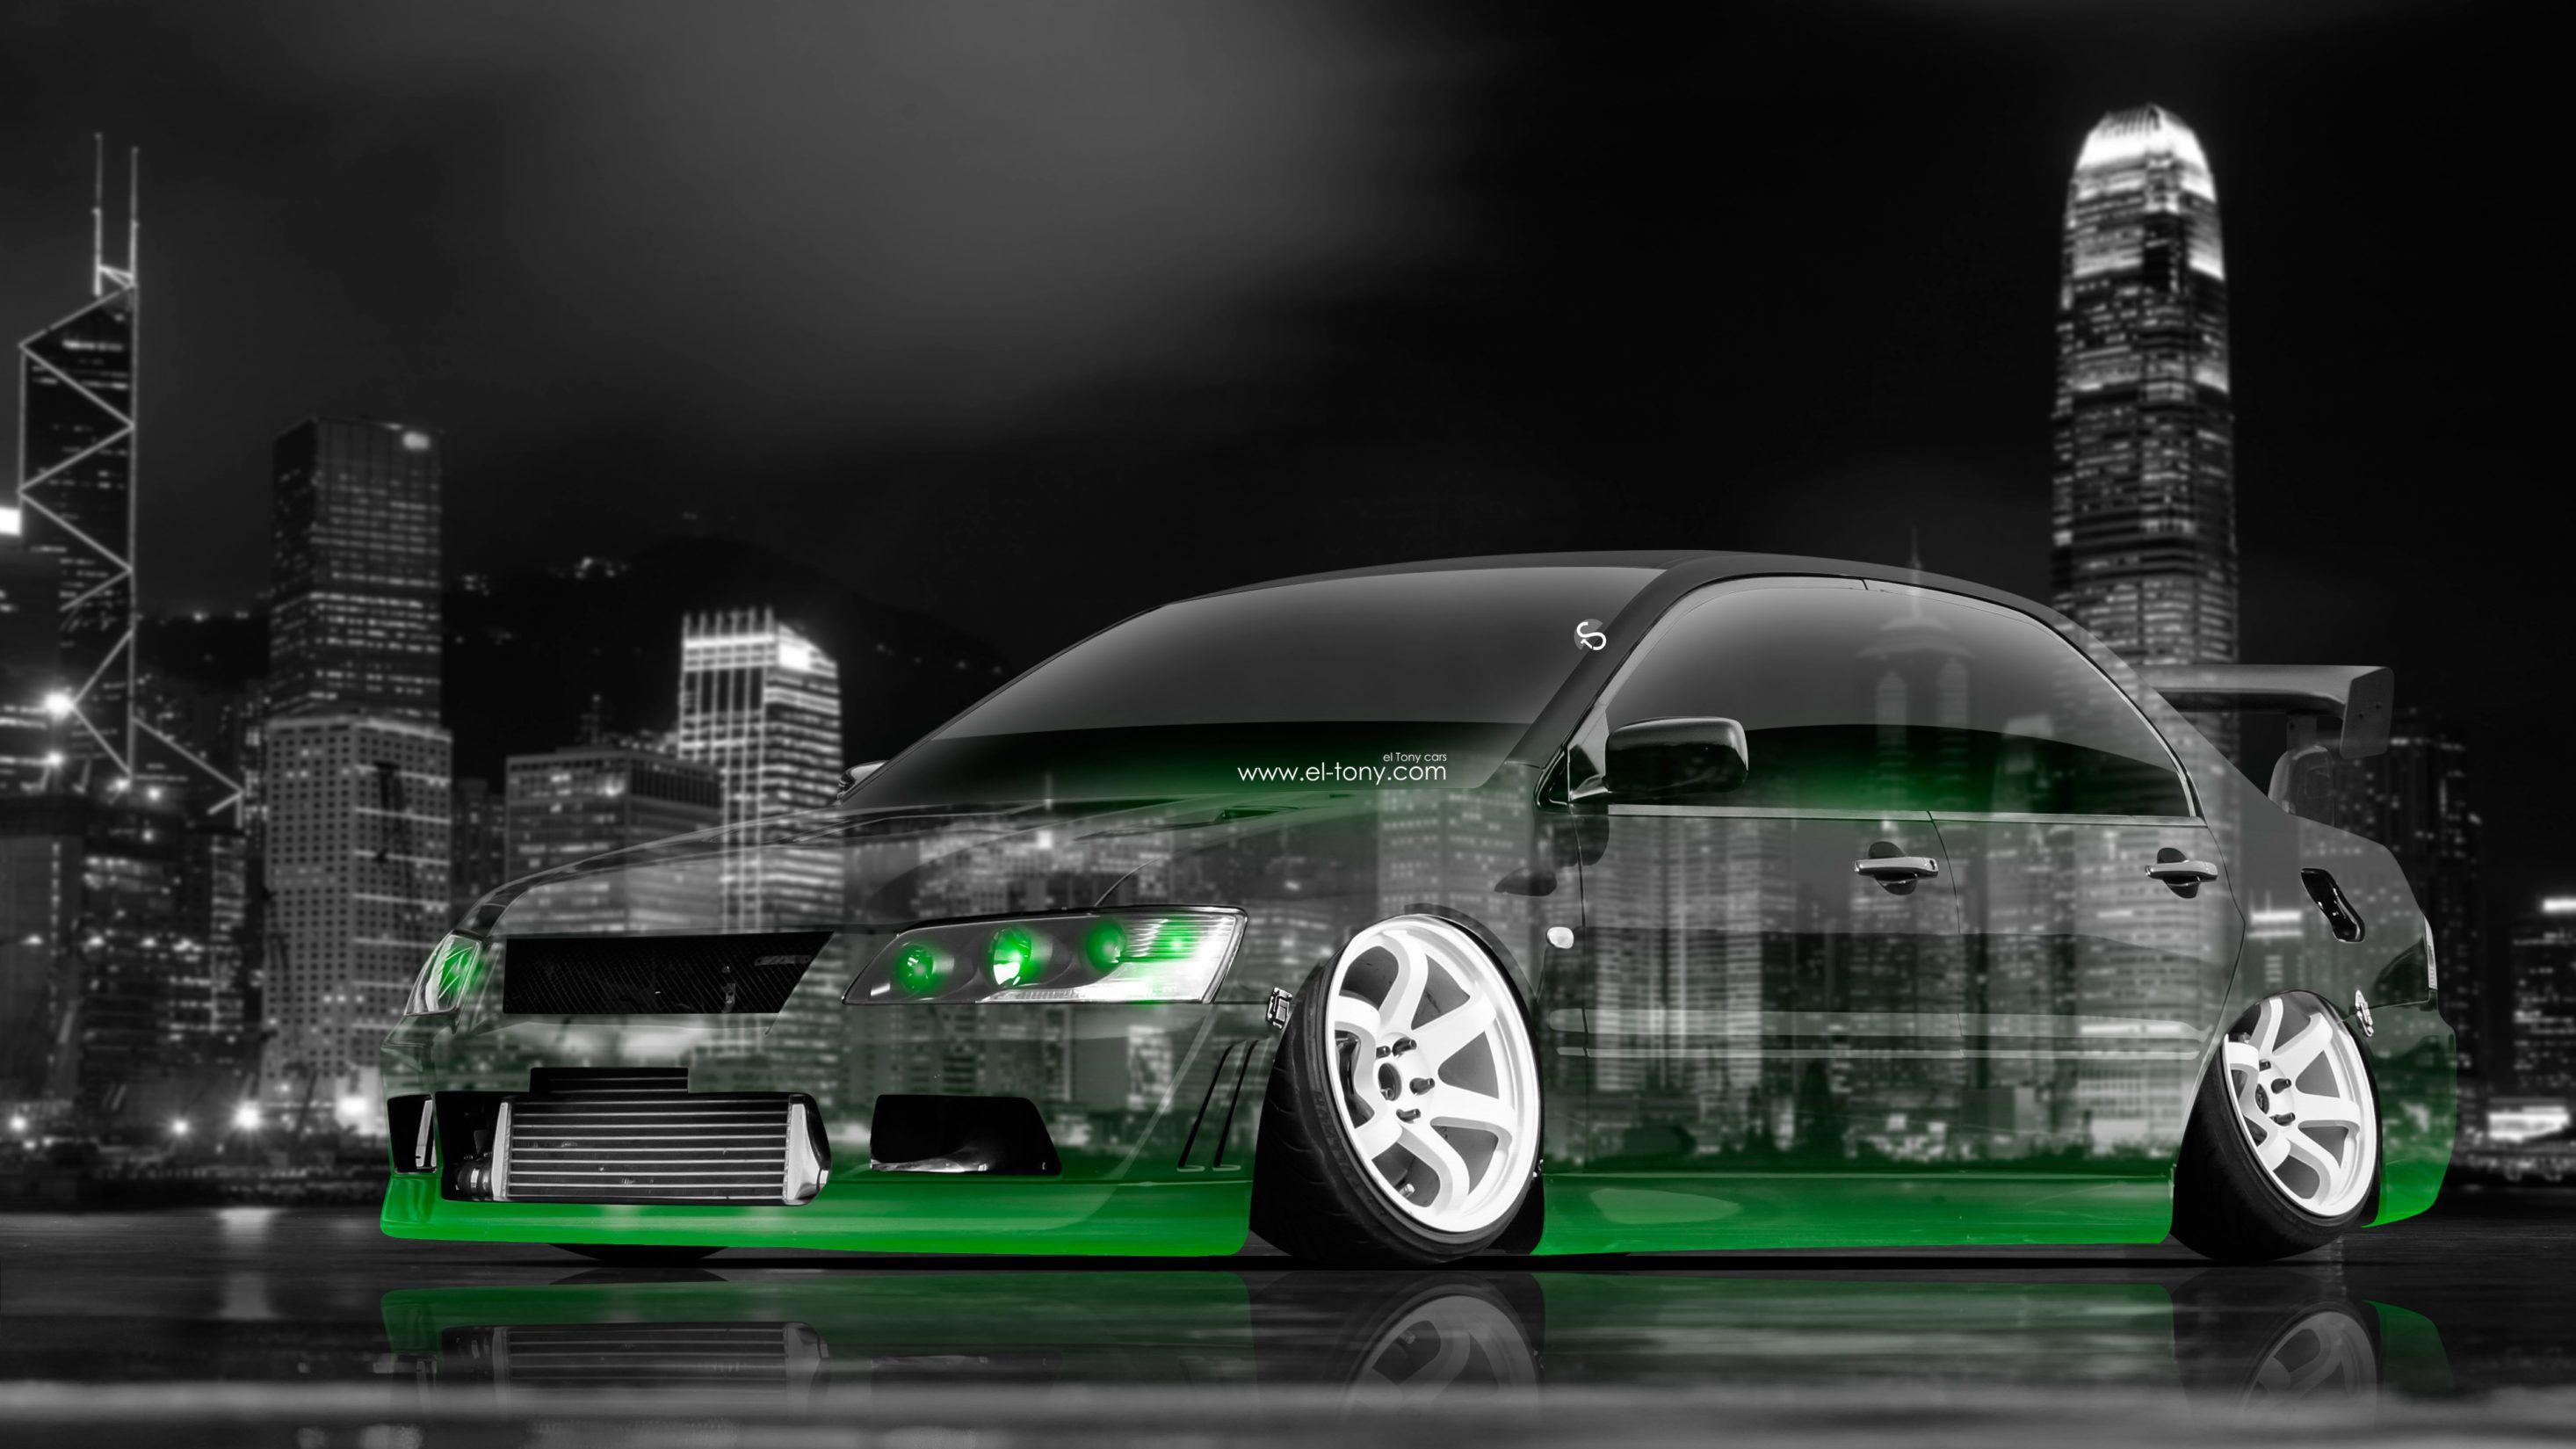 Jdm Cars 4k Wallpapers Top Free Jdm Cars 4k Backgrounds Wallpaperaccess